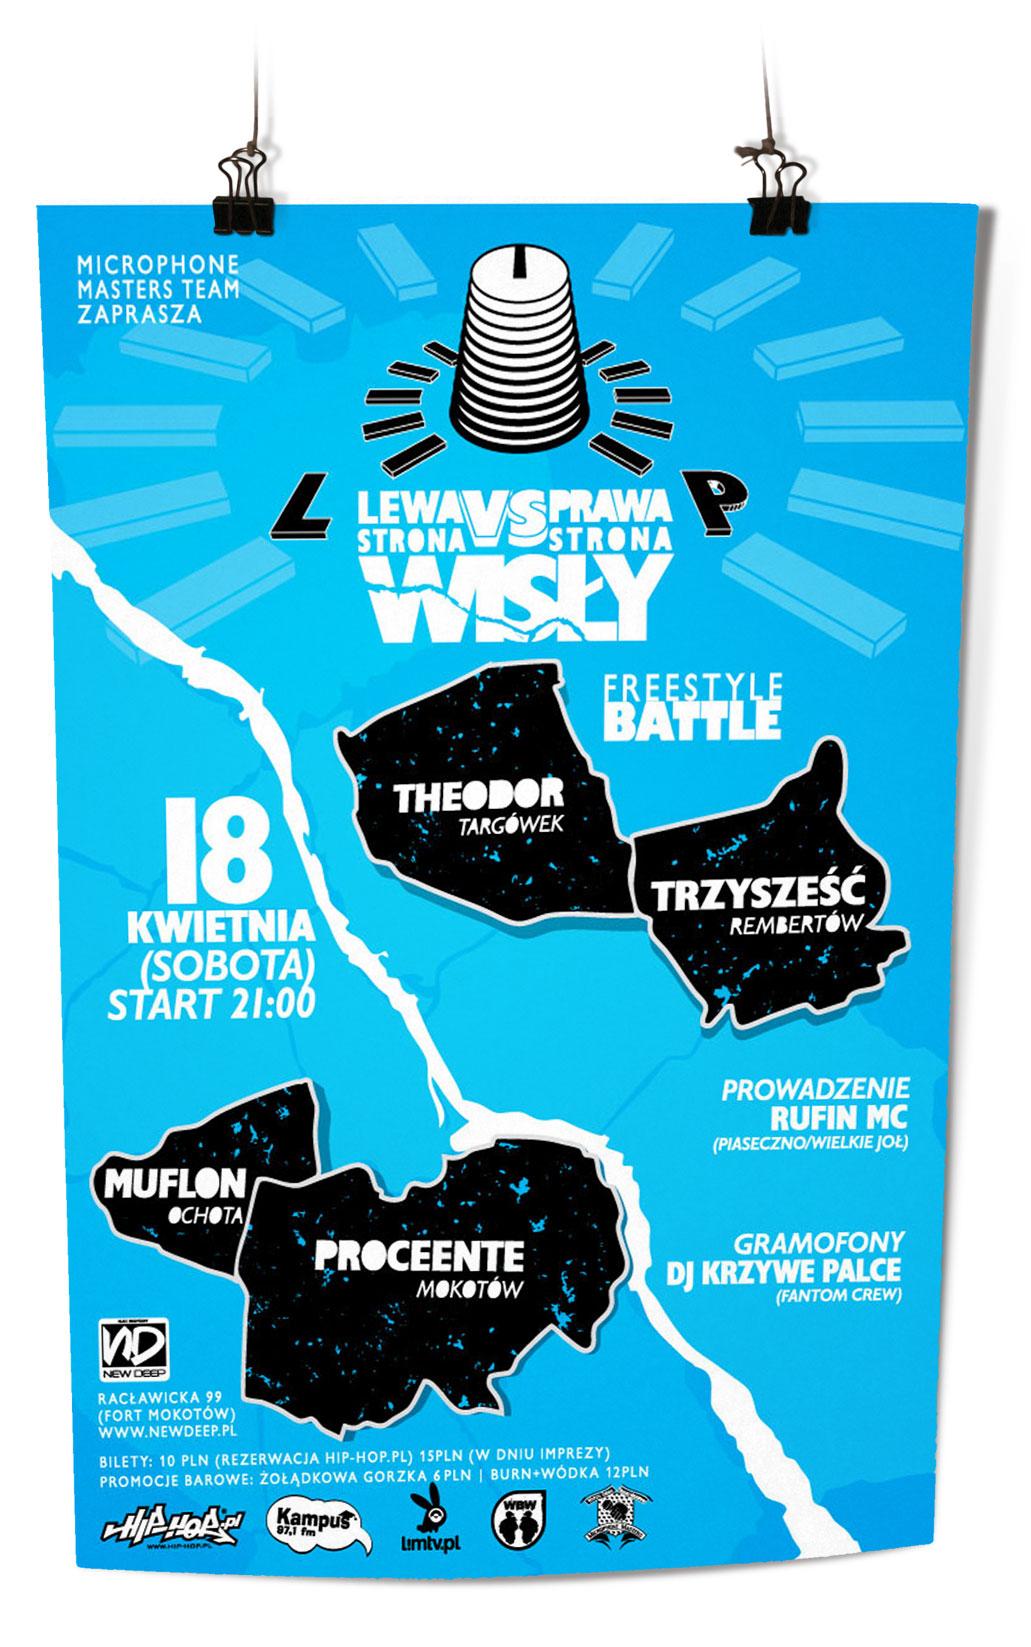 plakat Bitwa MC Prawa Lewa strona Wisły